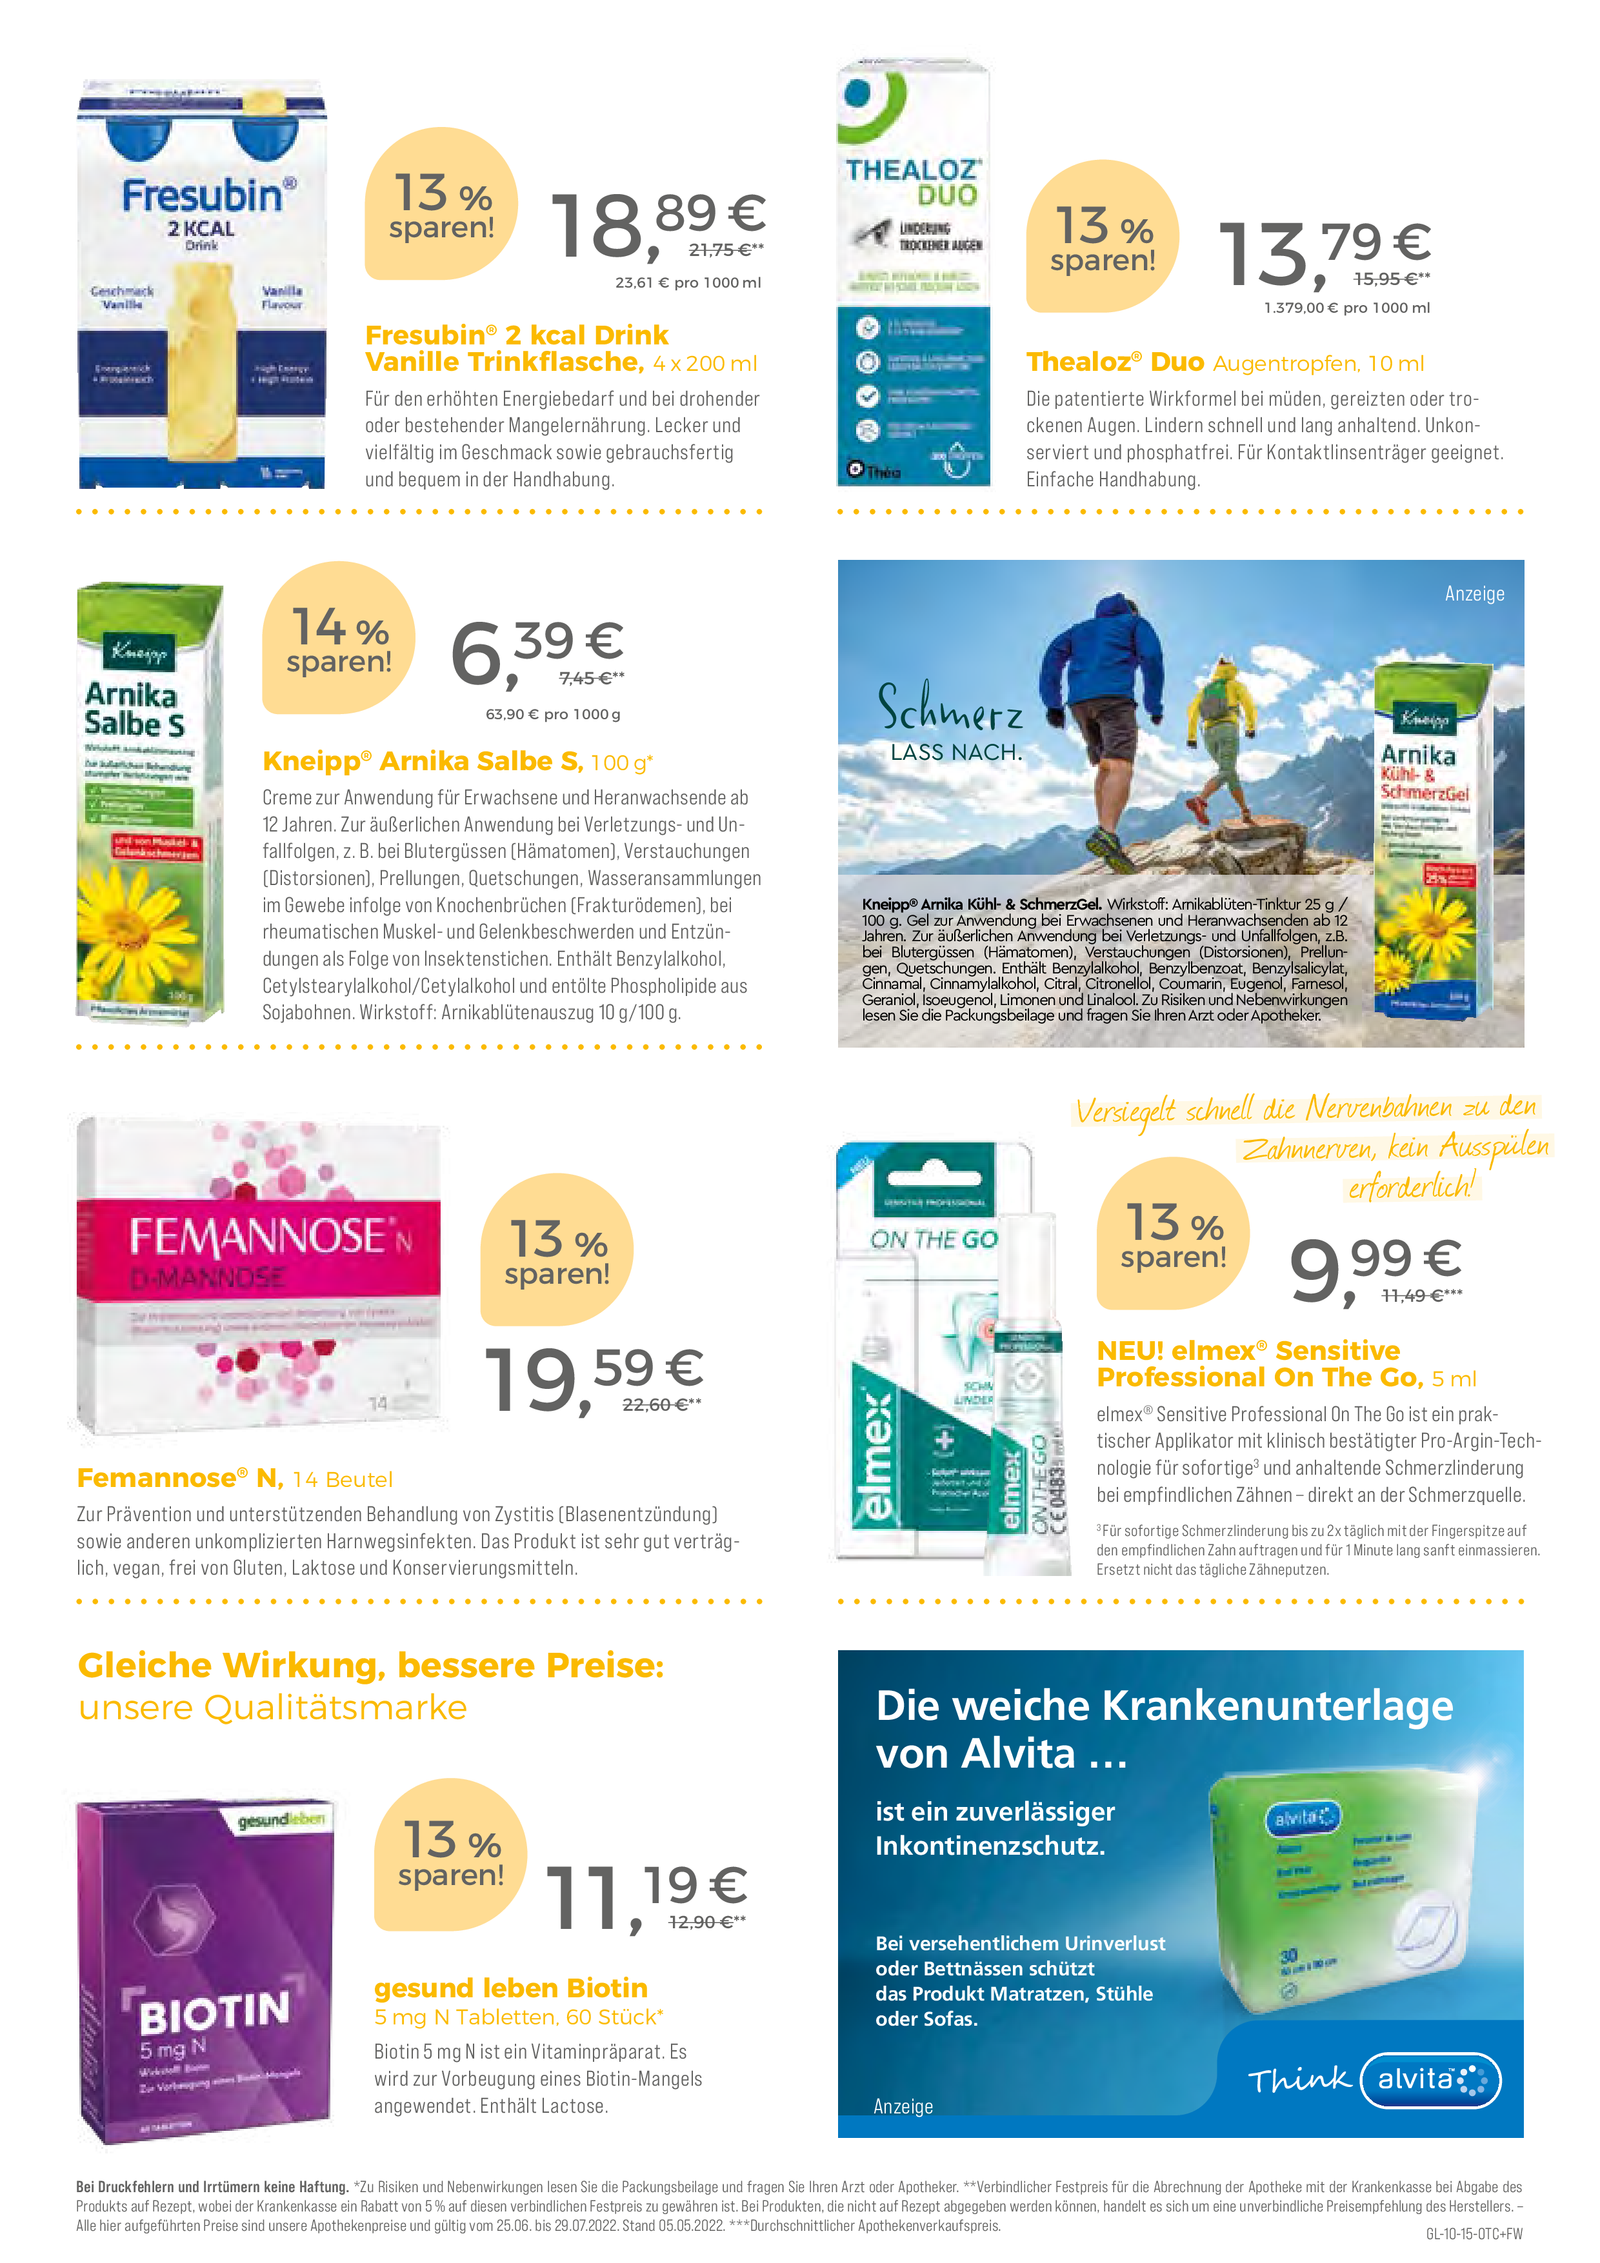 https://mein-uploads.apocdn.net/3912/leaflets/gesundleben_niedrig-Seite3.png